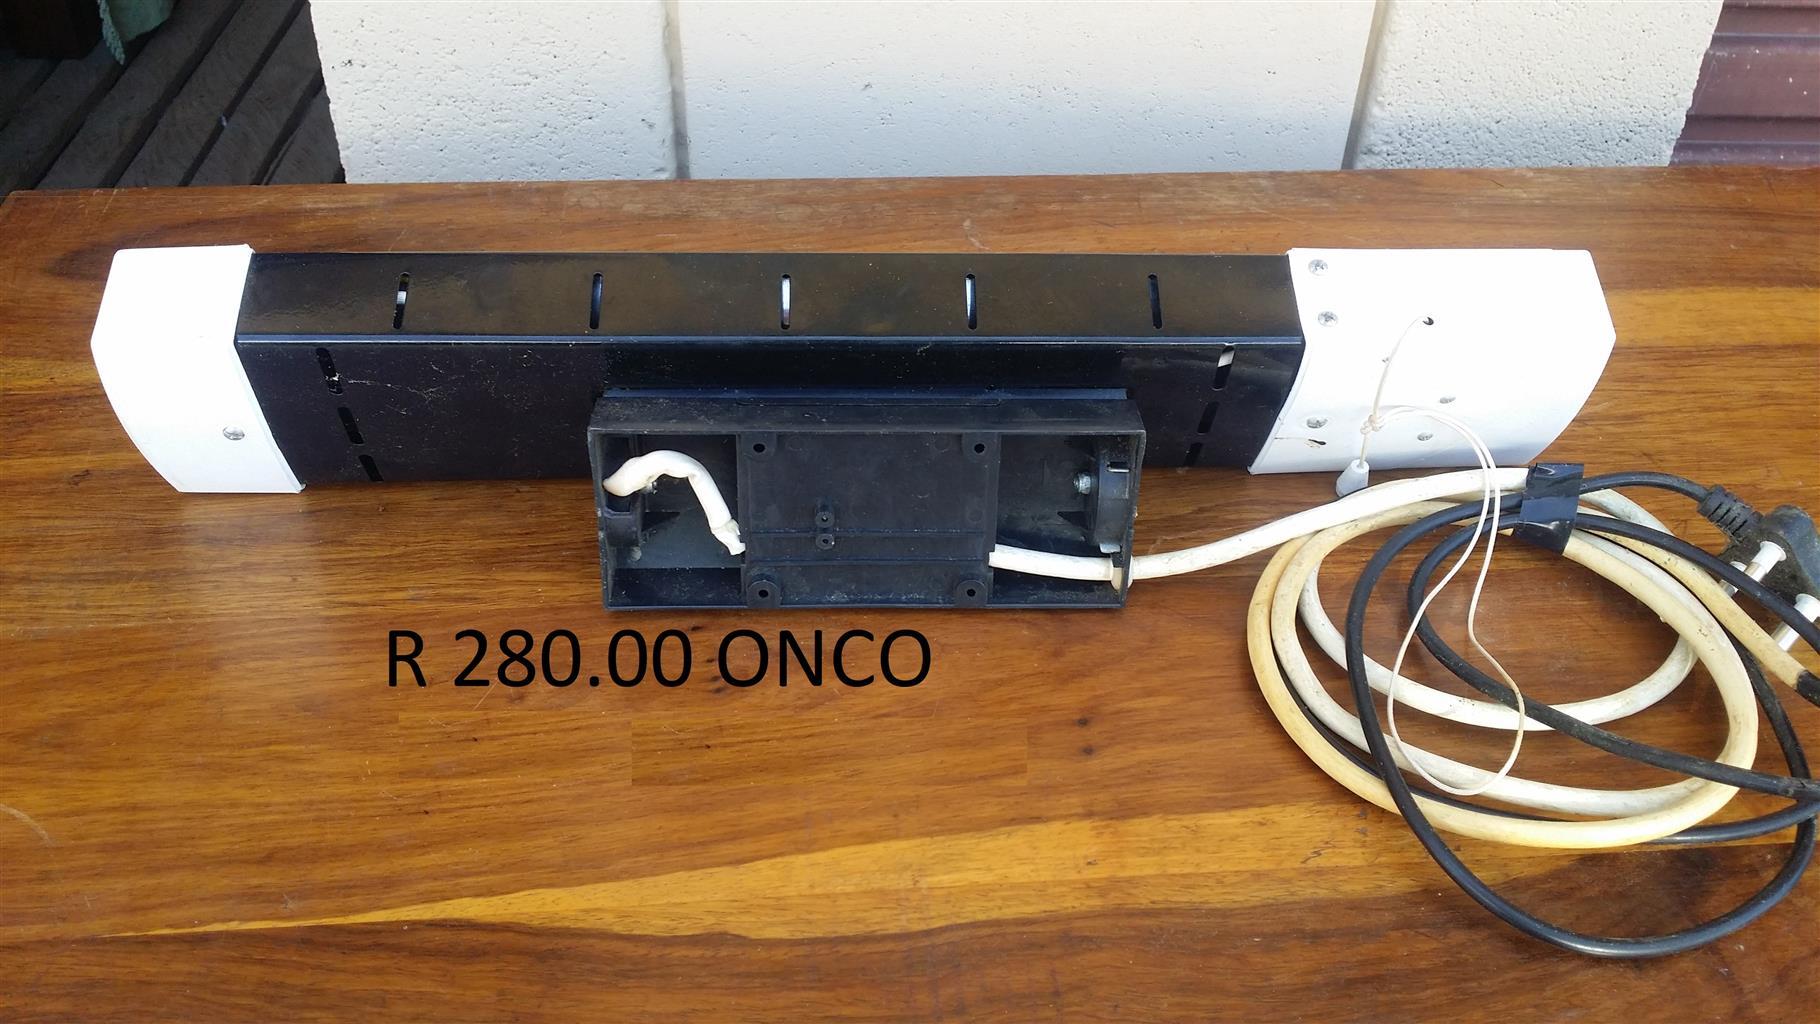 1 x Logik 2 bar heater